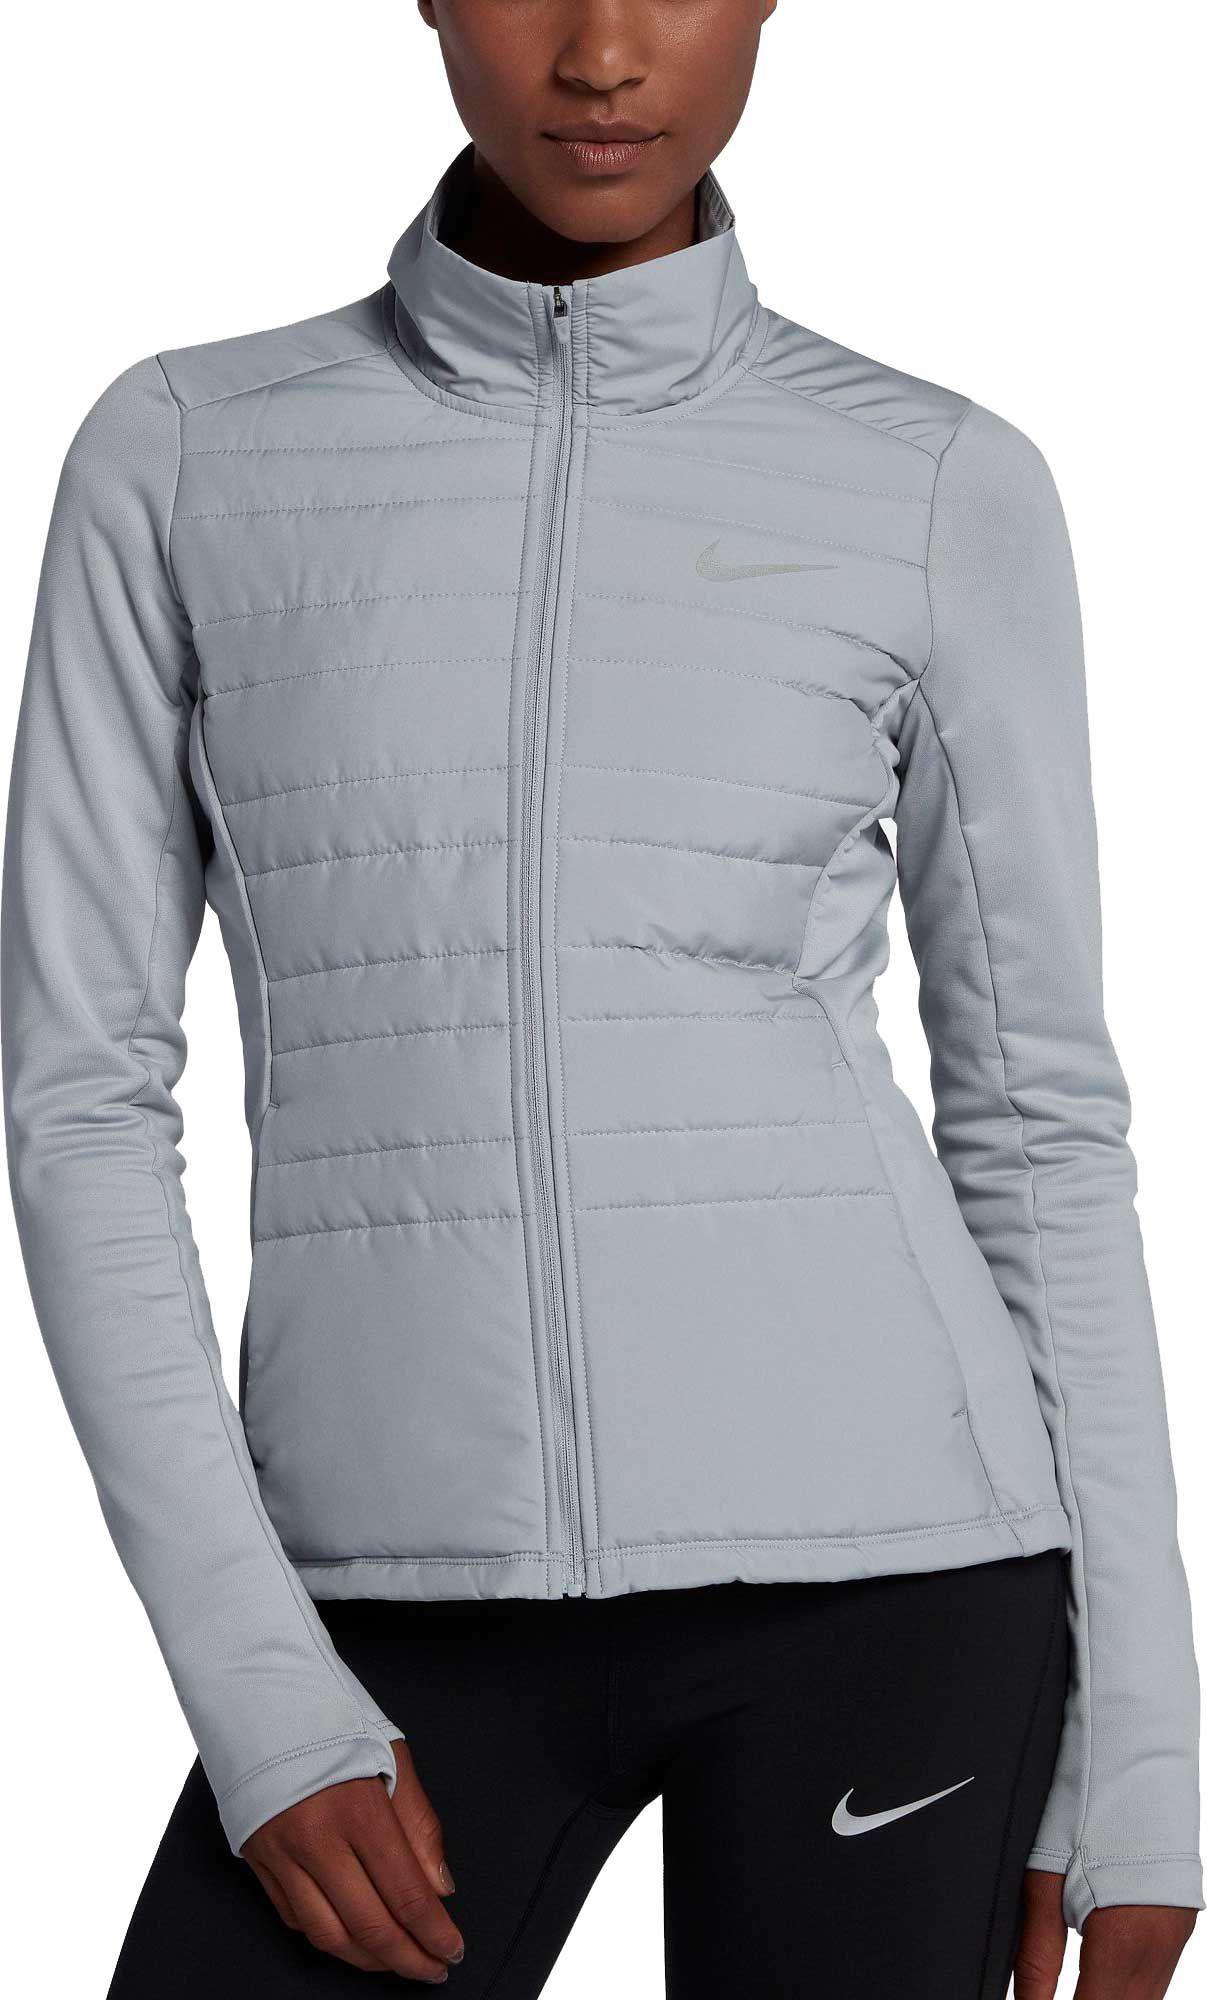 58e562e9caac Nike Women s Essential Full Zip Running Jacket